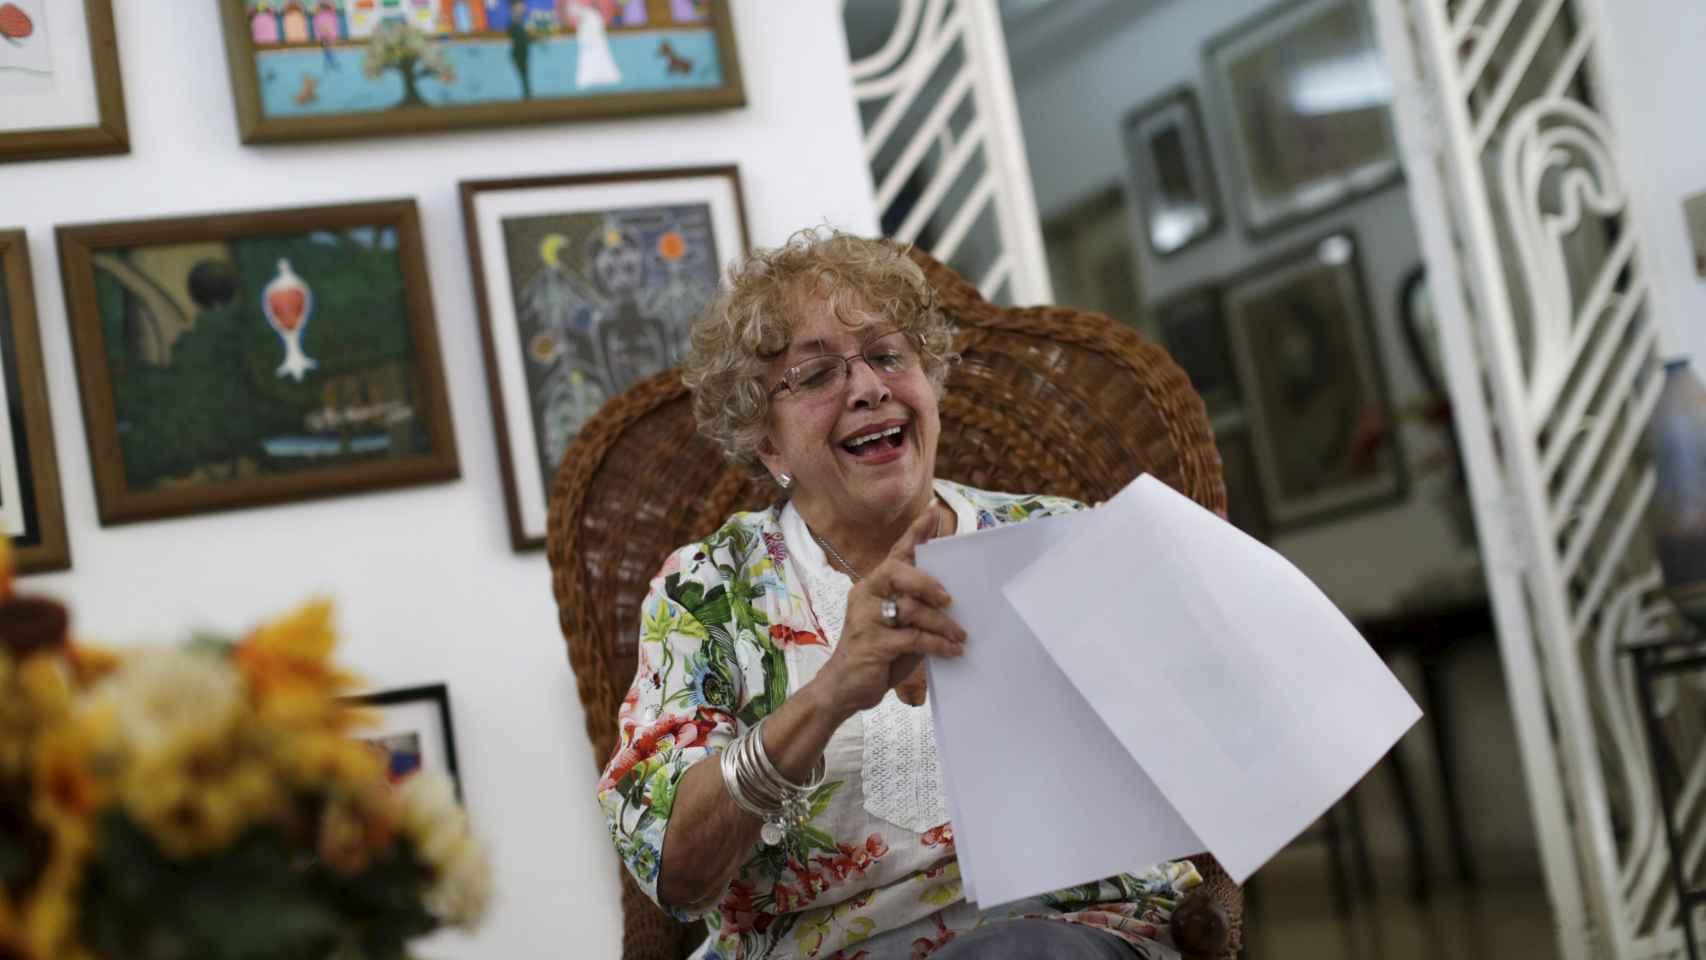 La cubana Ileana Rosa Yarza ha recibido una carta de Barack Obama.